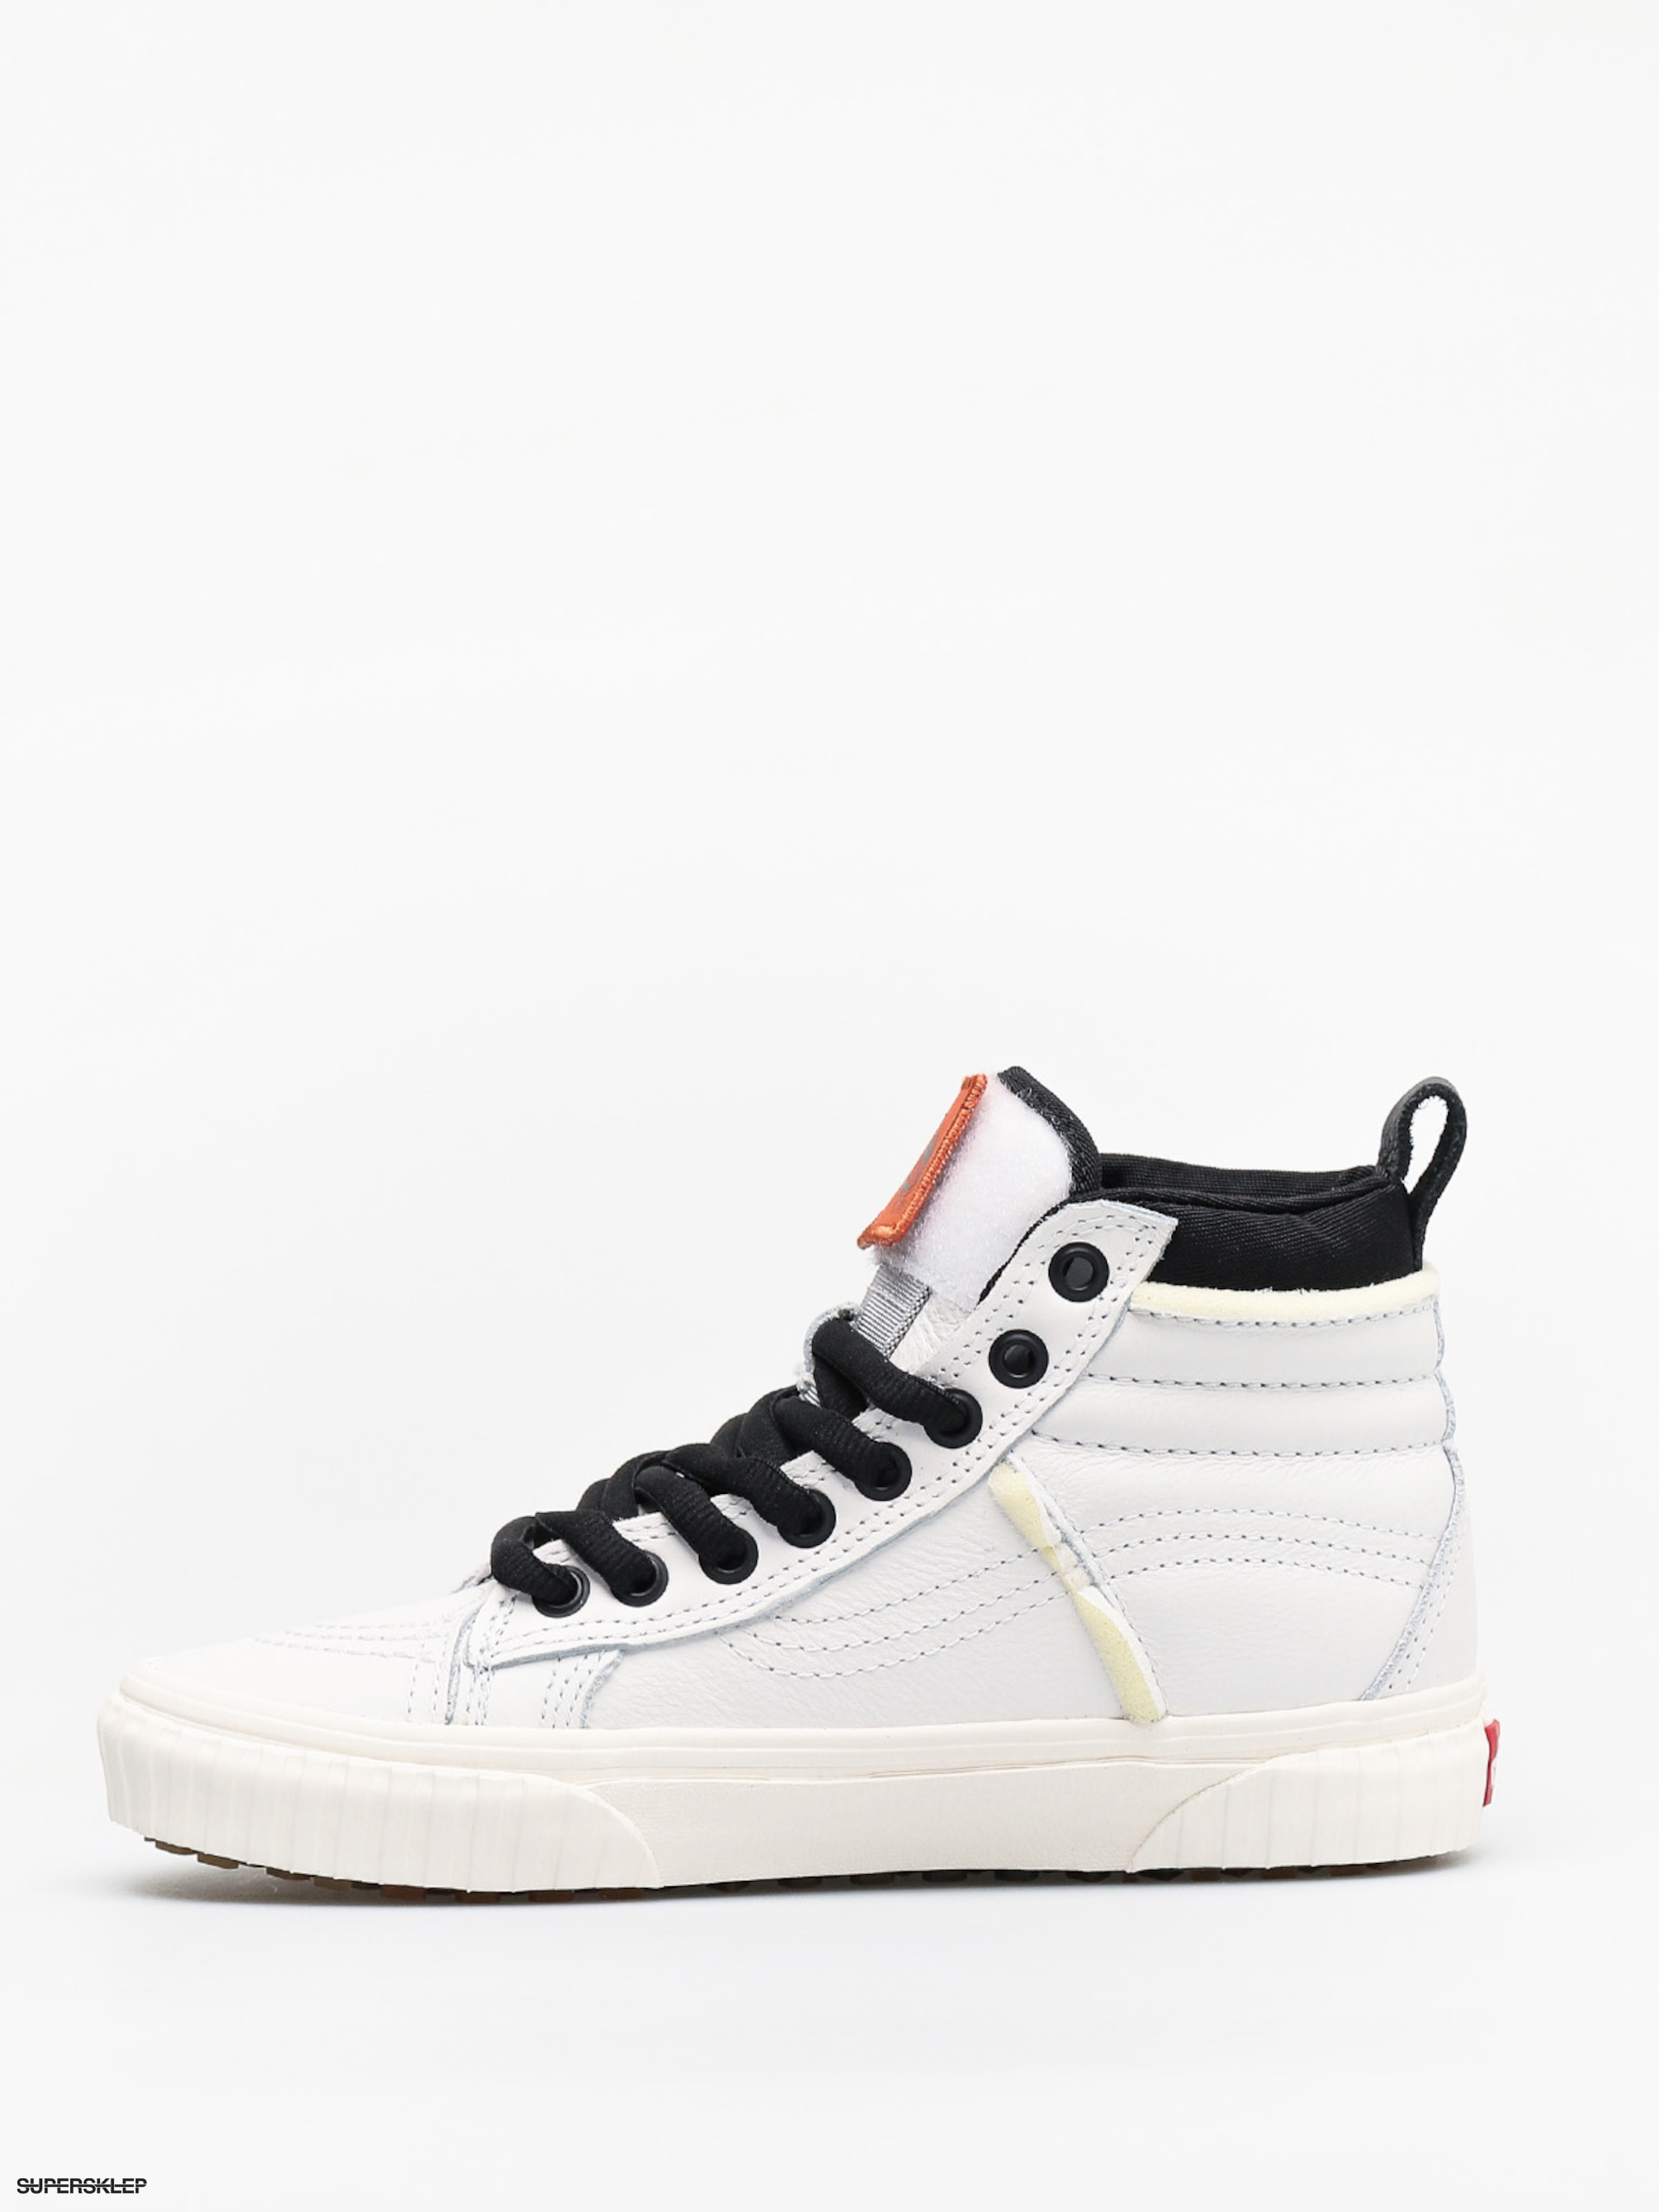 Vans Sk8 Hi Mte Space Voyager Shoes (nasatrue whiteblack)